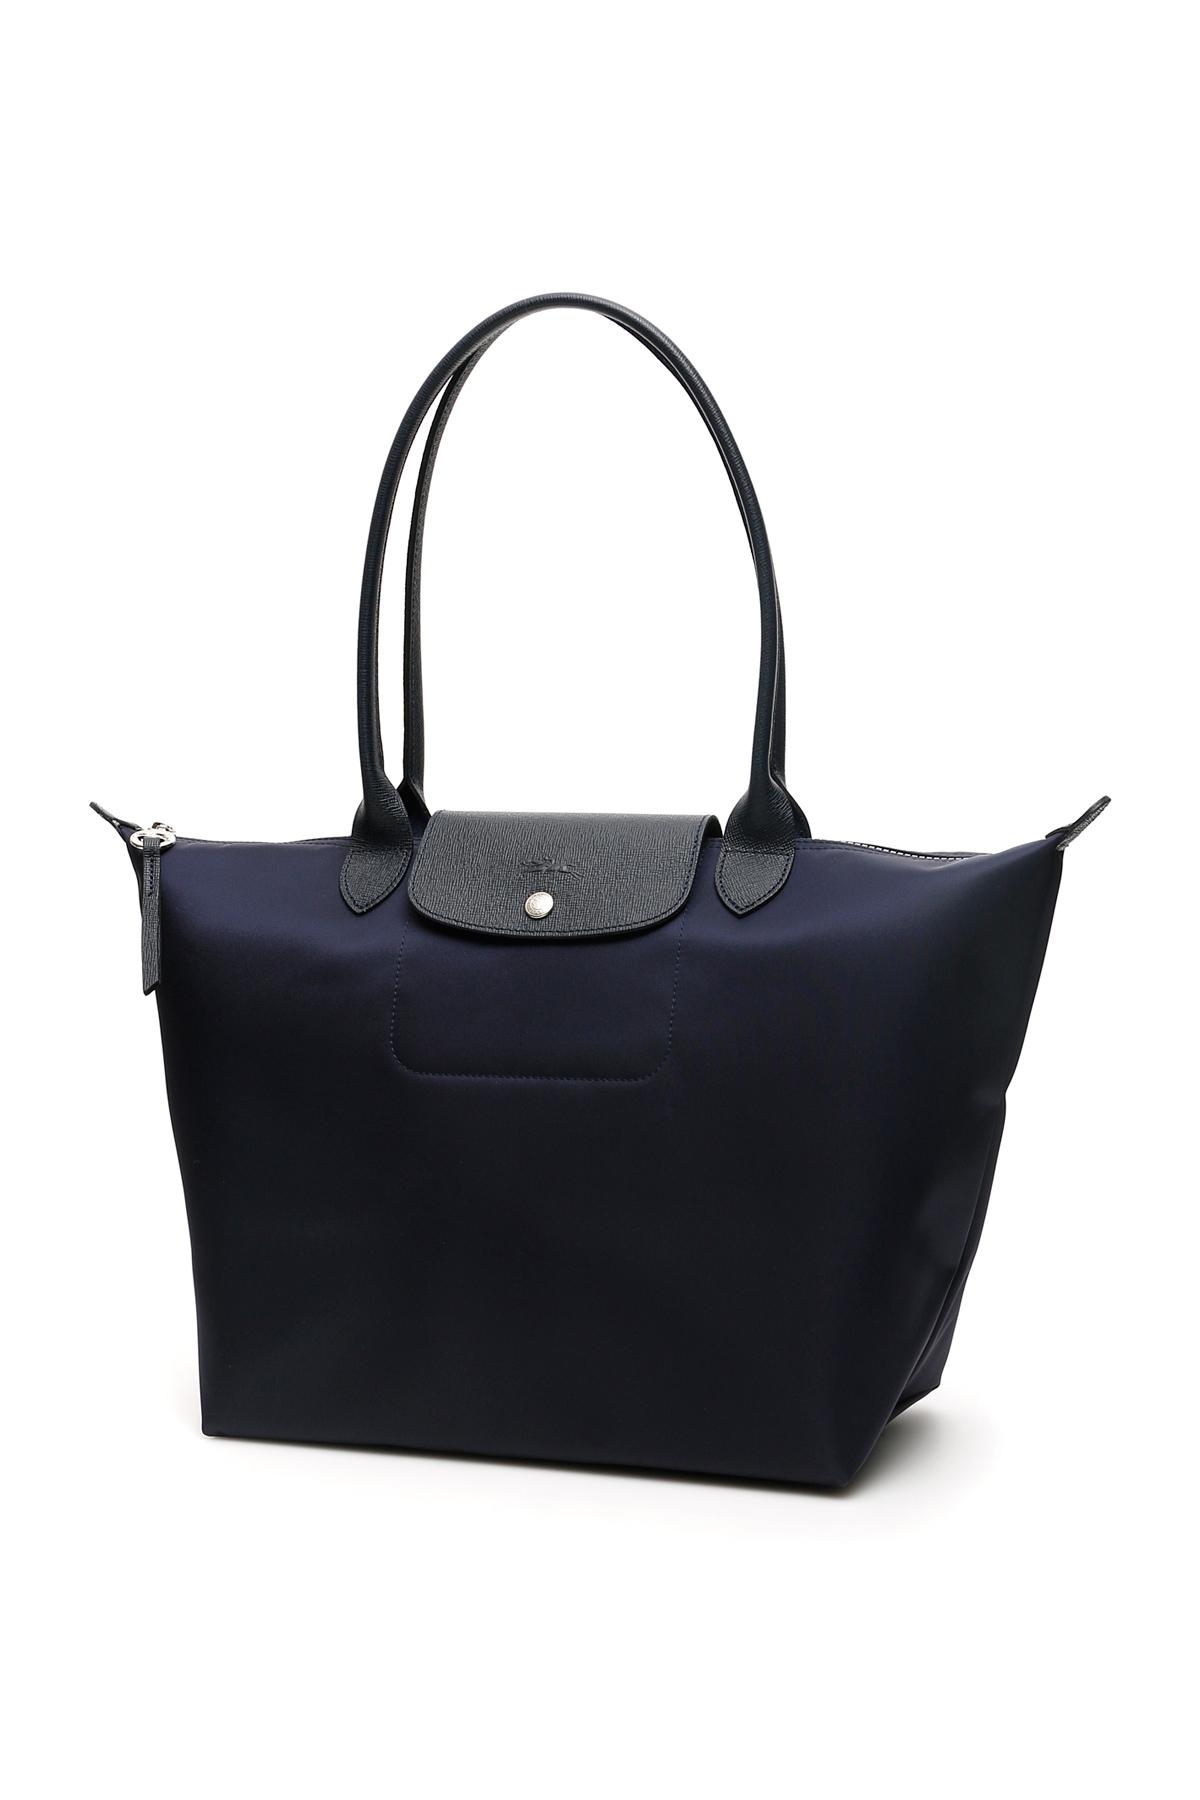 Longchamp shopping le pliage néo large